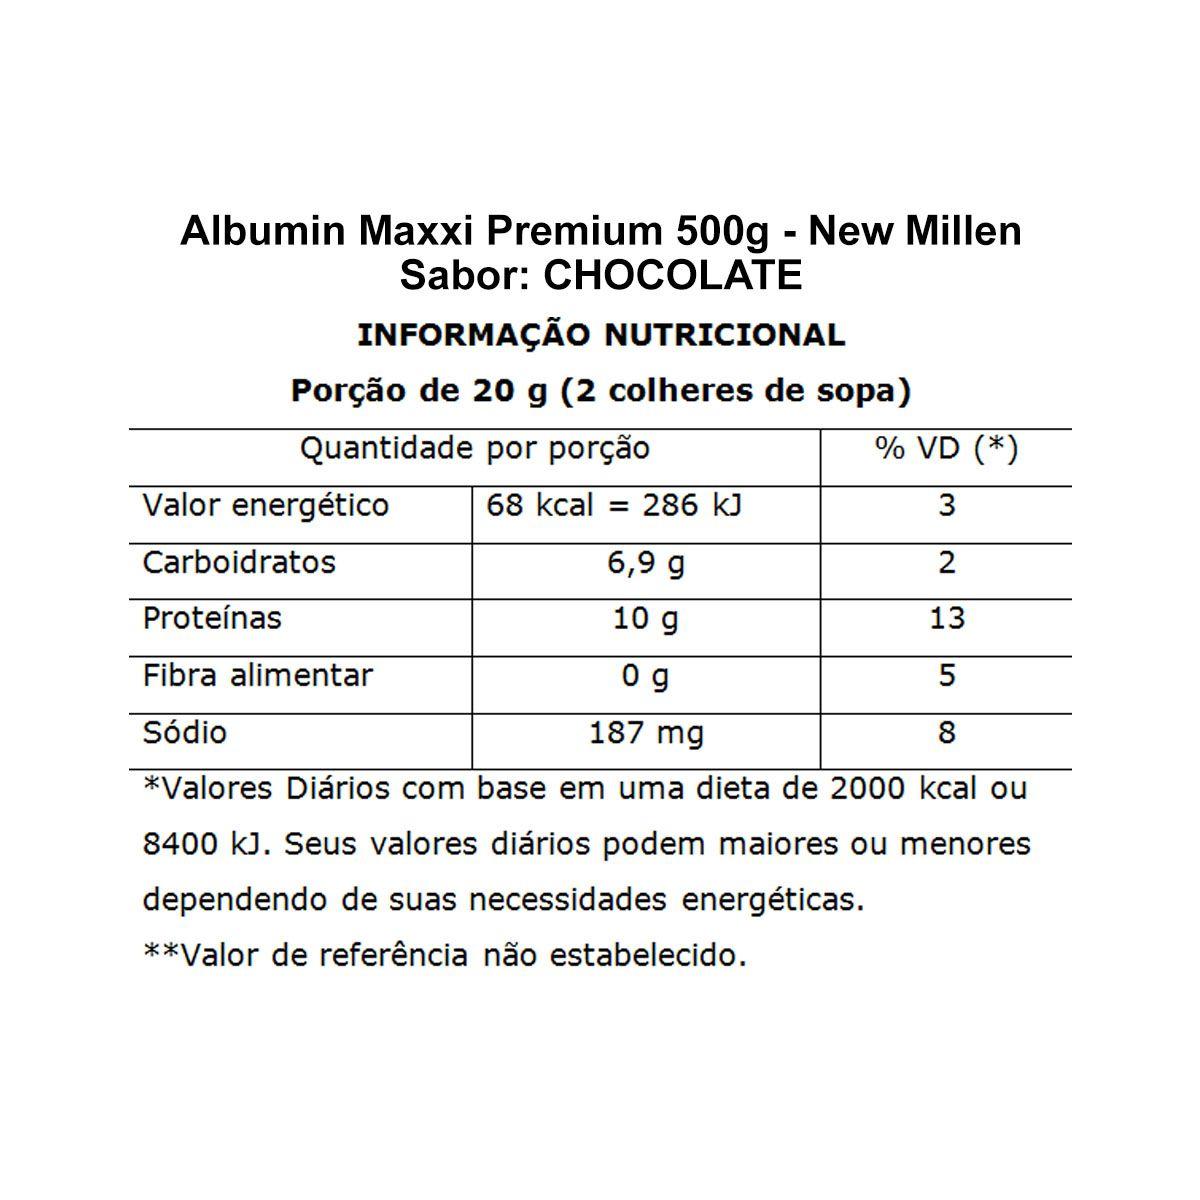 Albumin Maxxi Premium 500g - New Millen